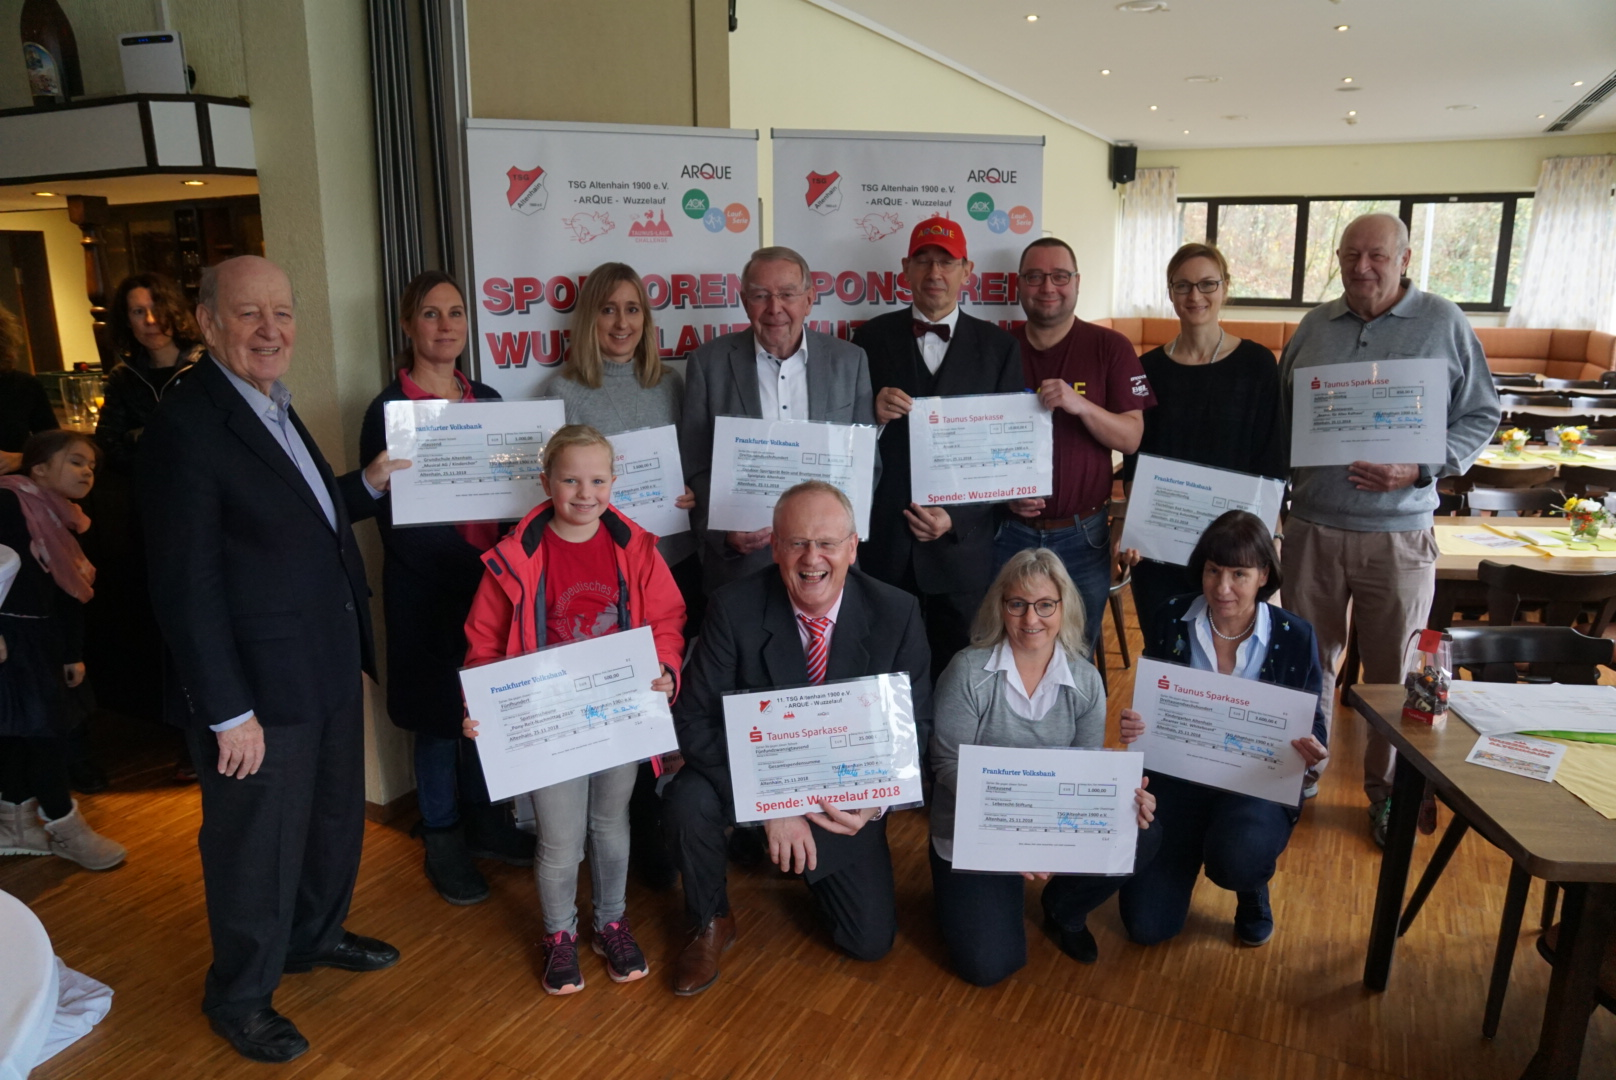 Spendenübergabe TSG Altenhain 2018 (Foto von TSG)